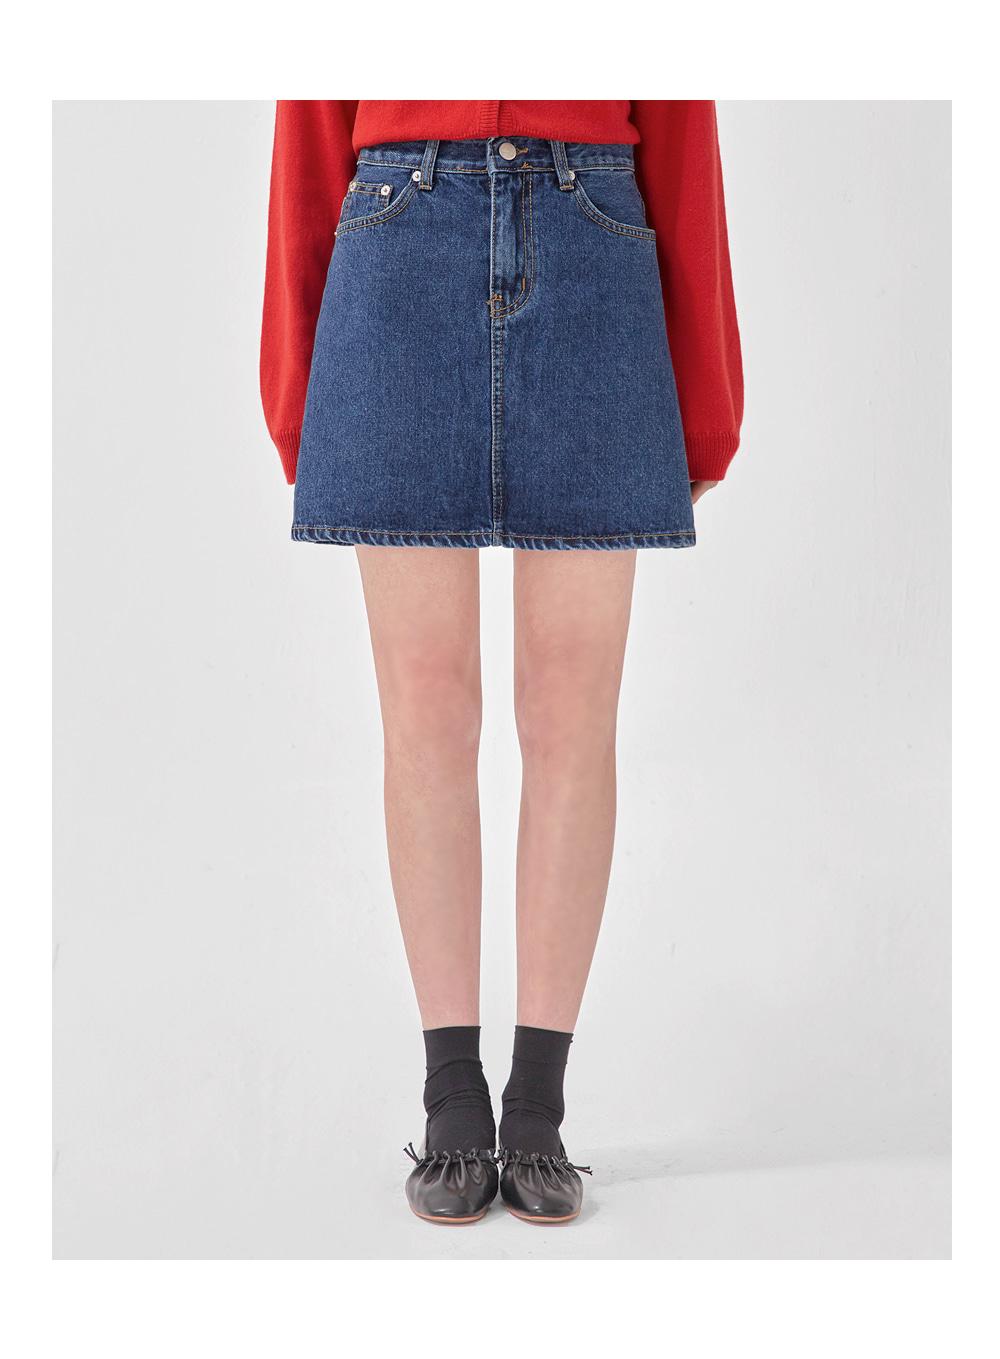 just denim mini skirt